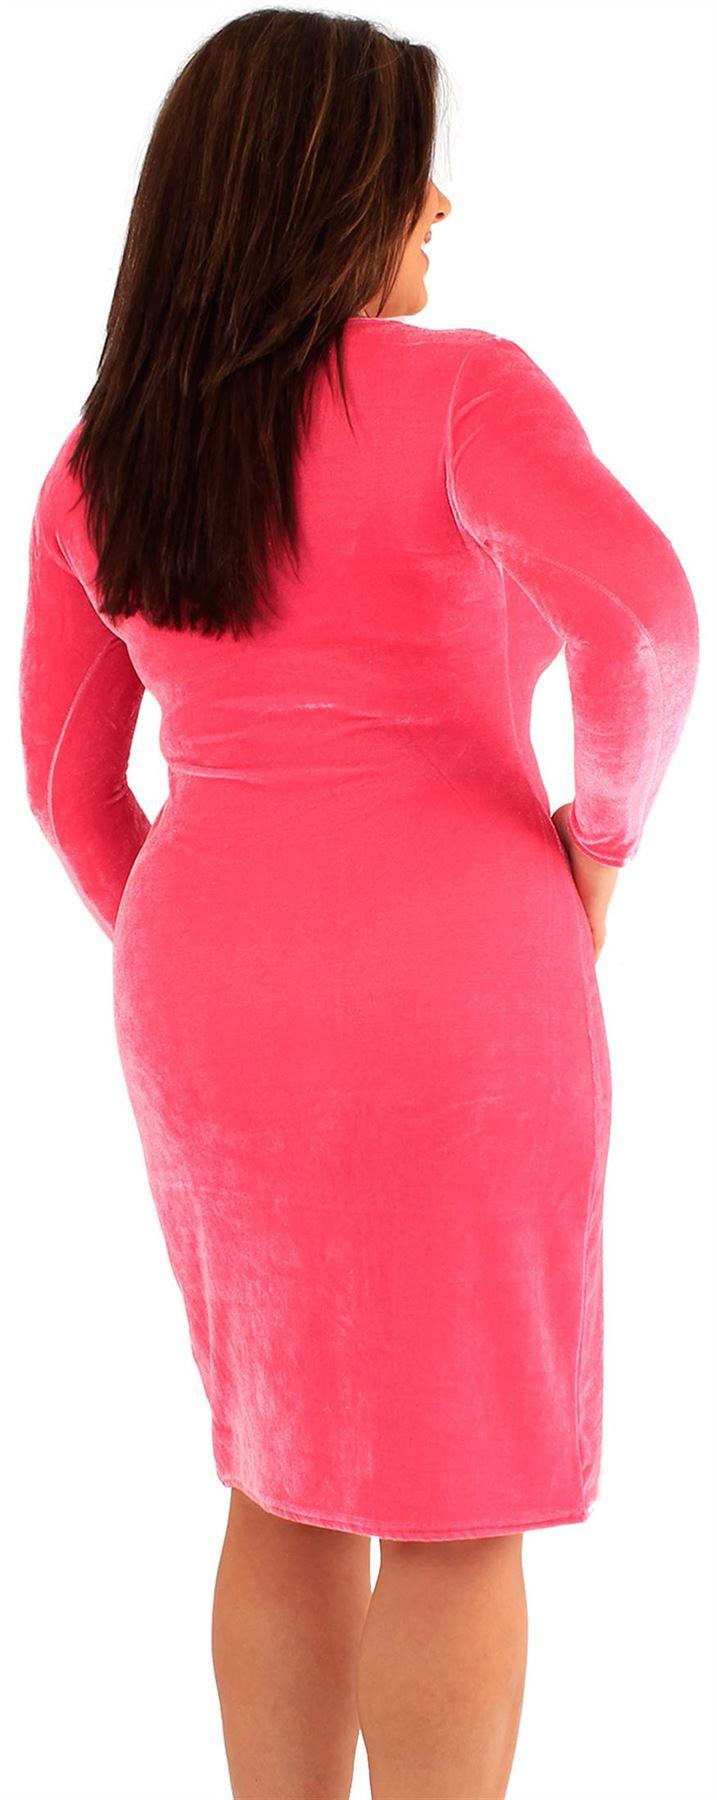 Black bodycon dresses haul new york city shoulder surgery evening wear